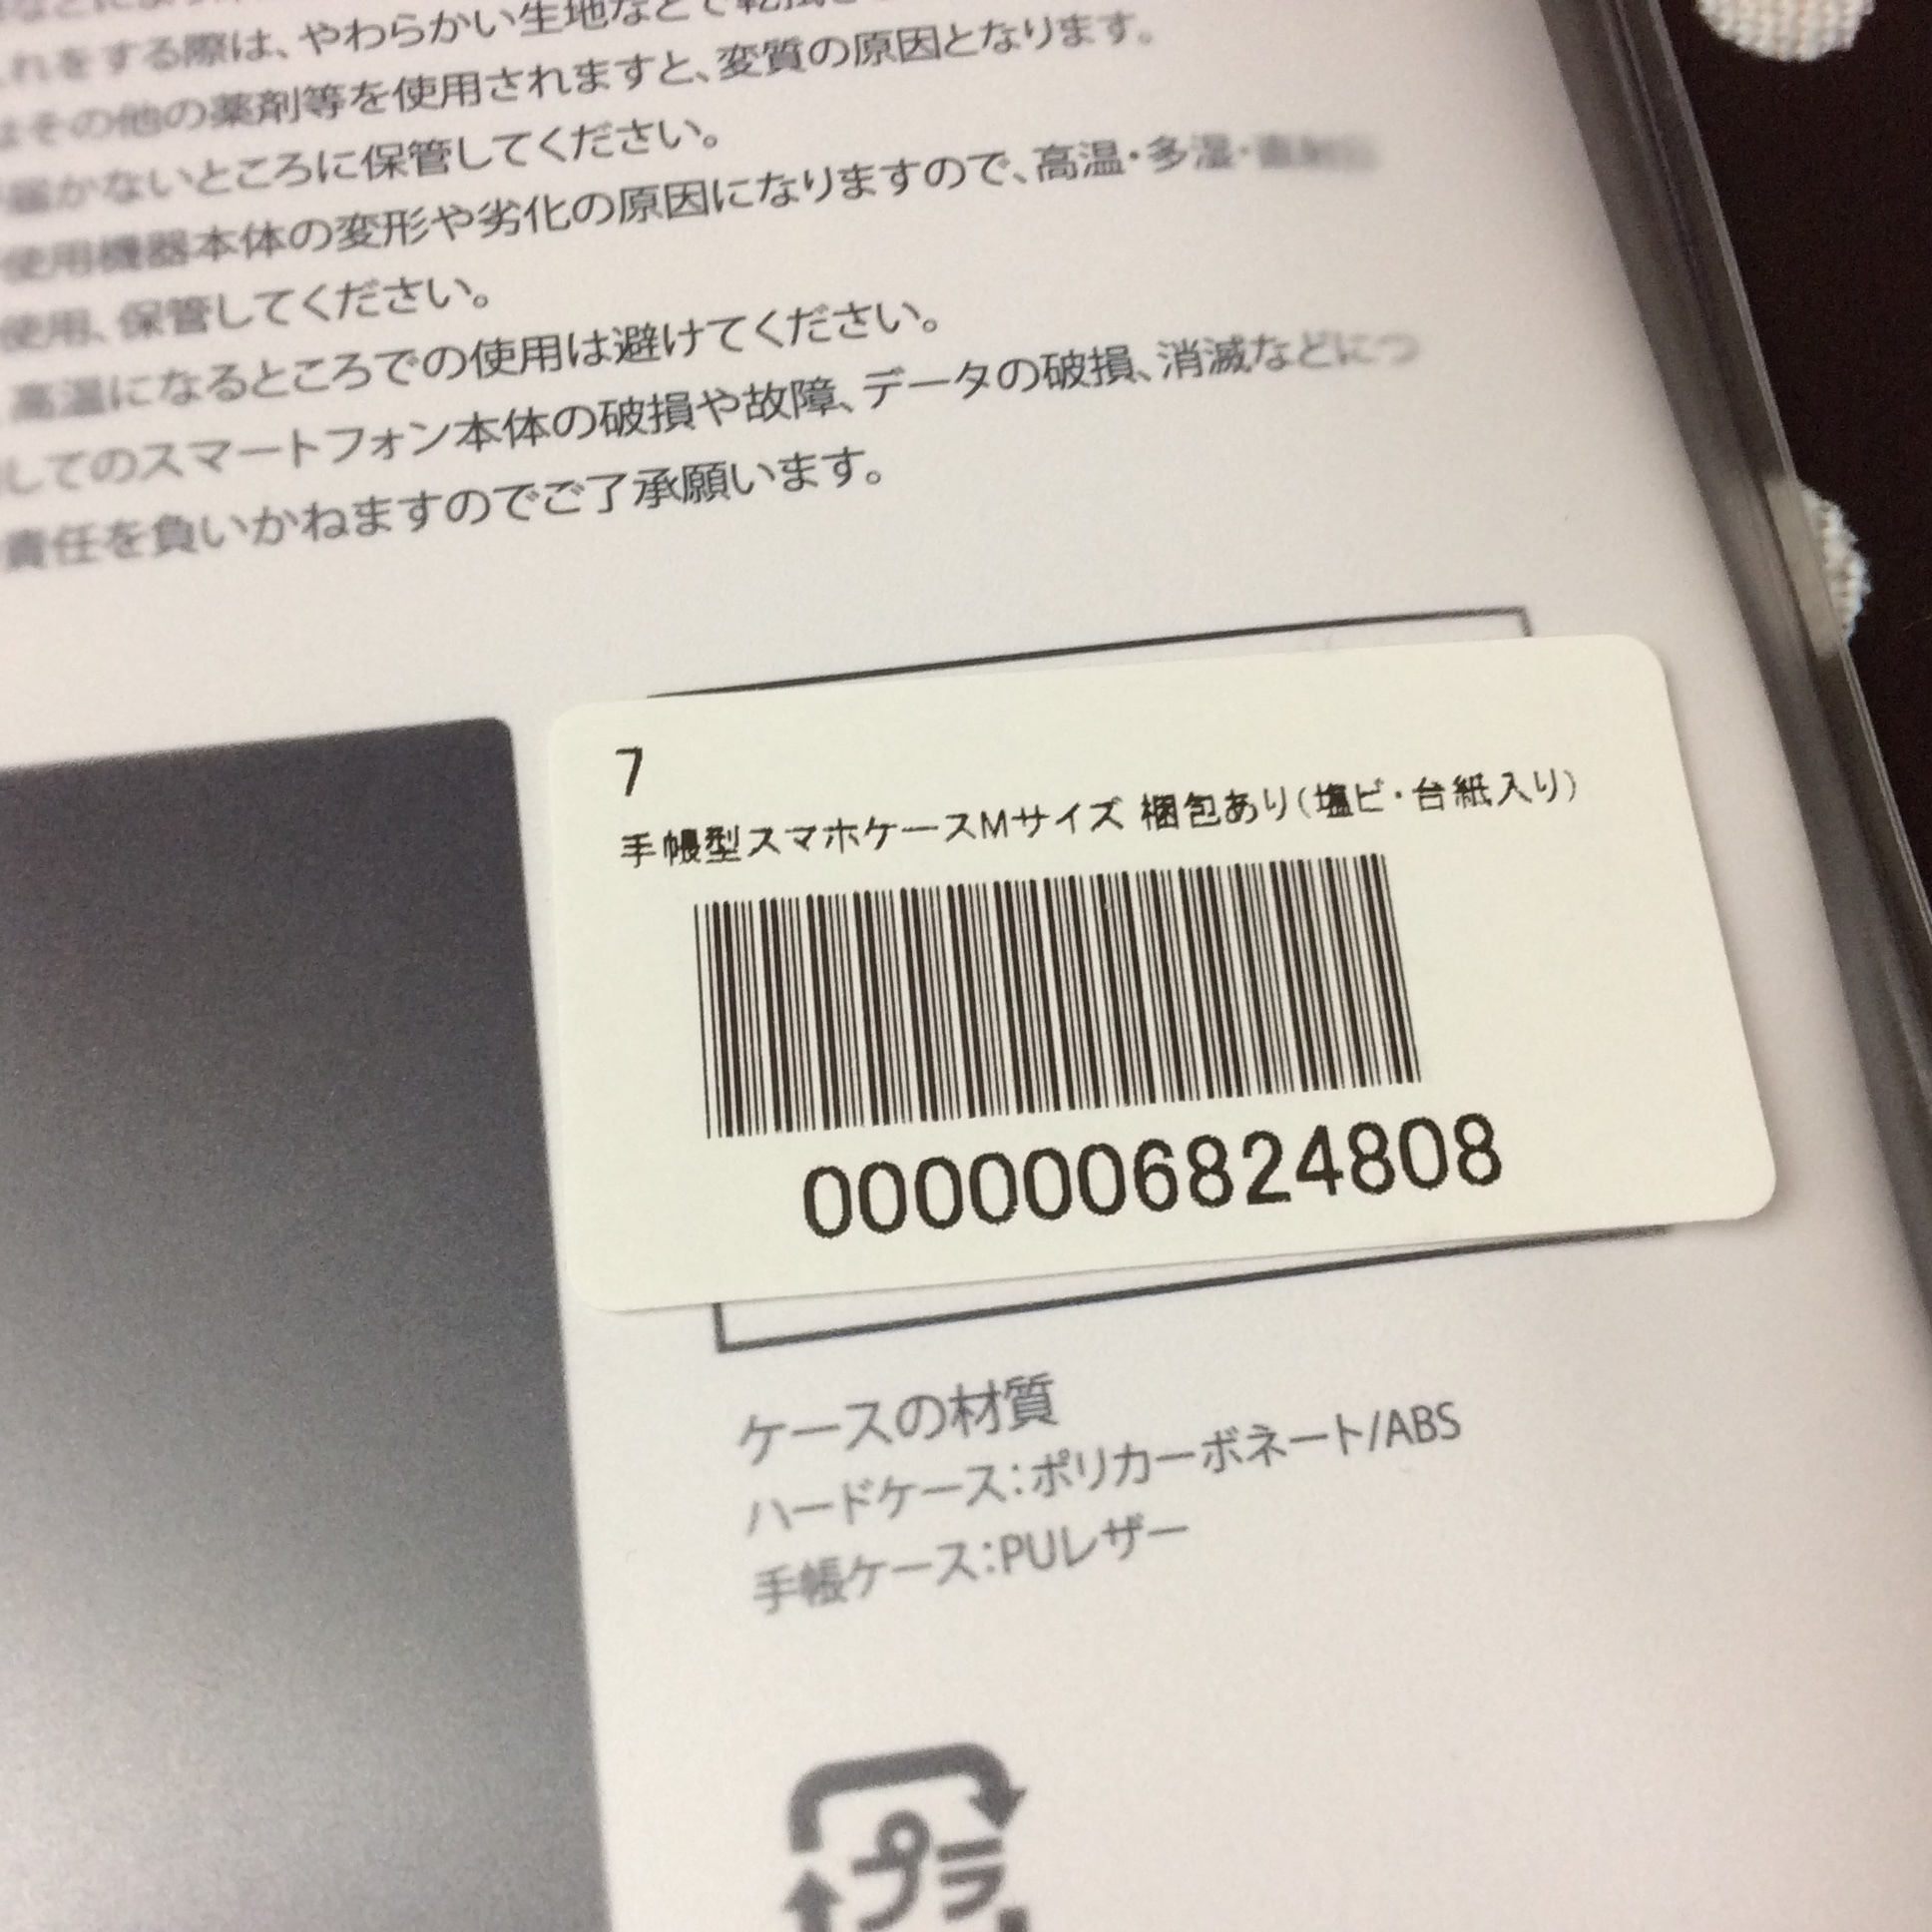 16D93C83-DAA0-47B1-B4F8-0C507515897A.jpeg